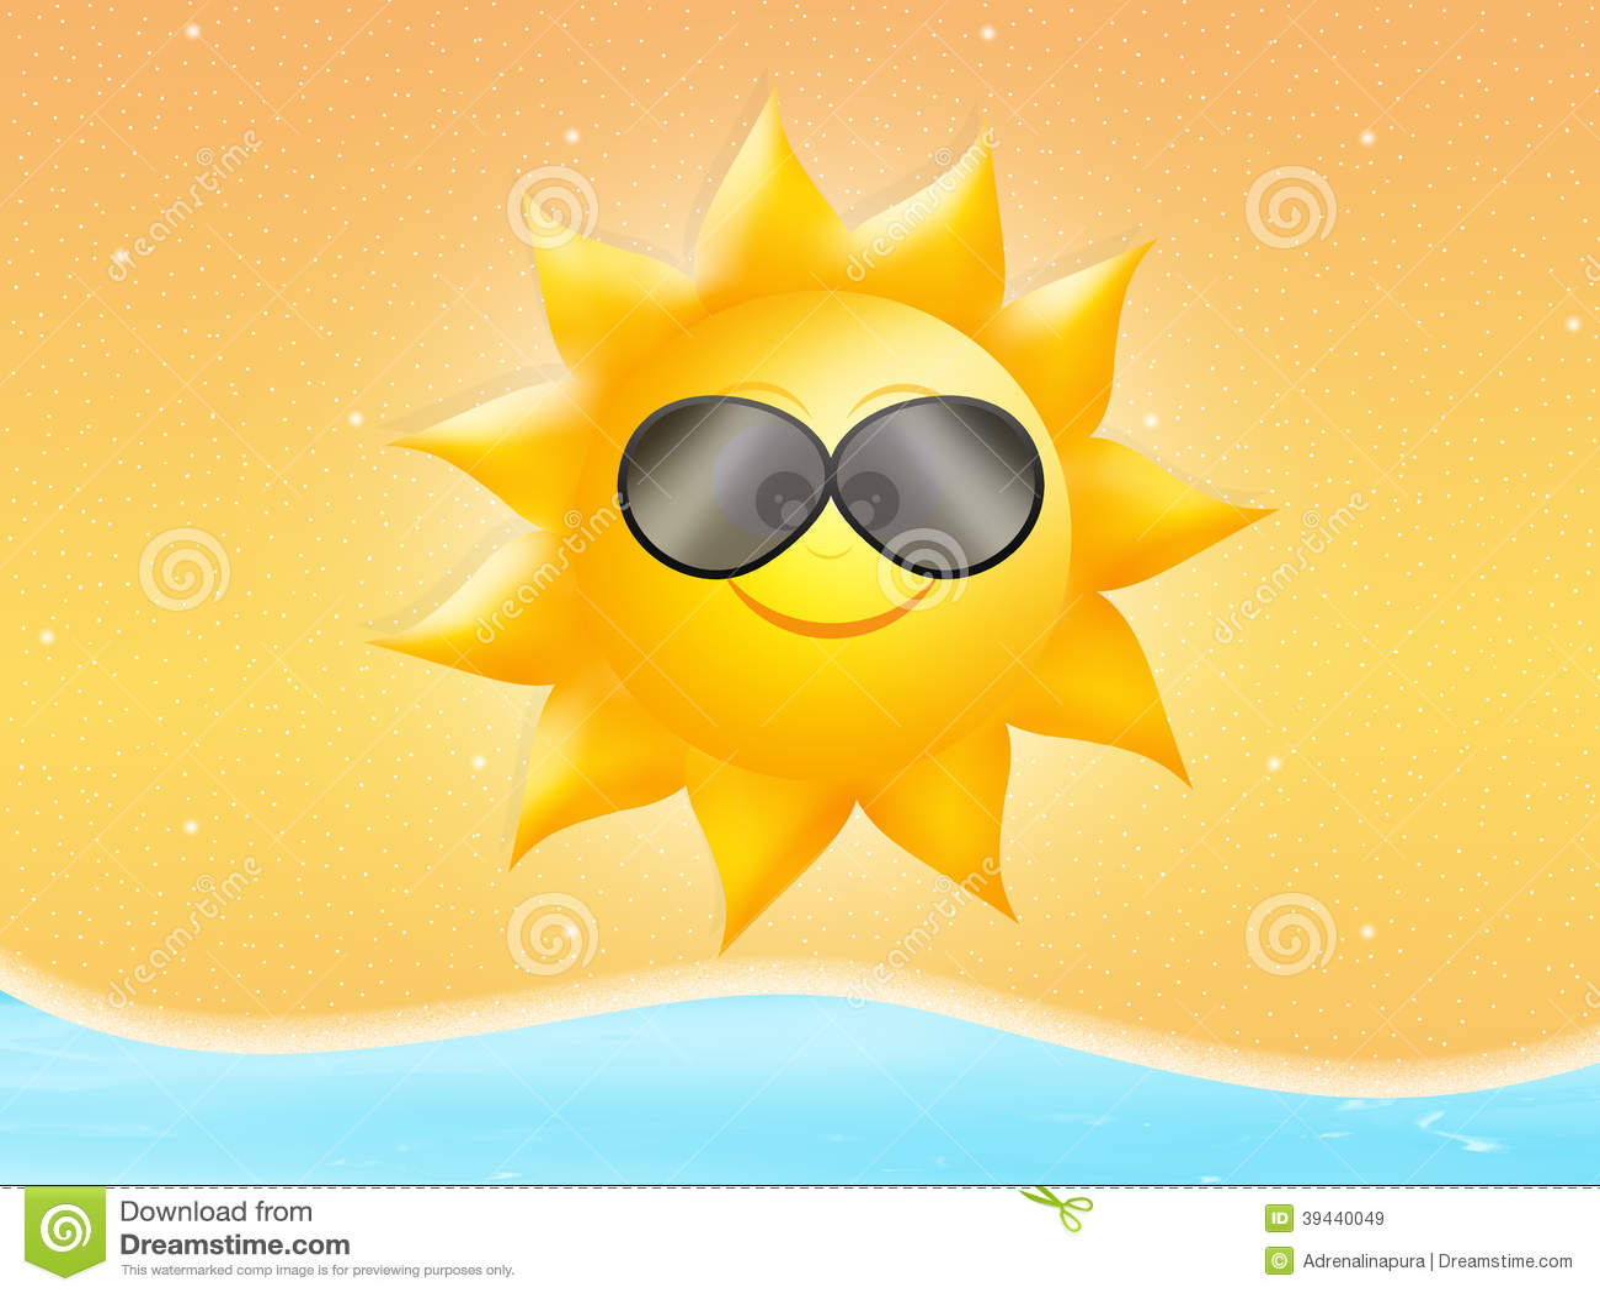 Sun With Sunglasses Stock Illustration - Image: 39440049